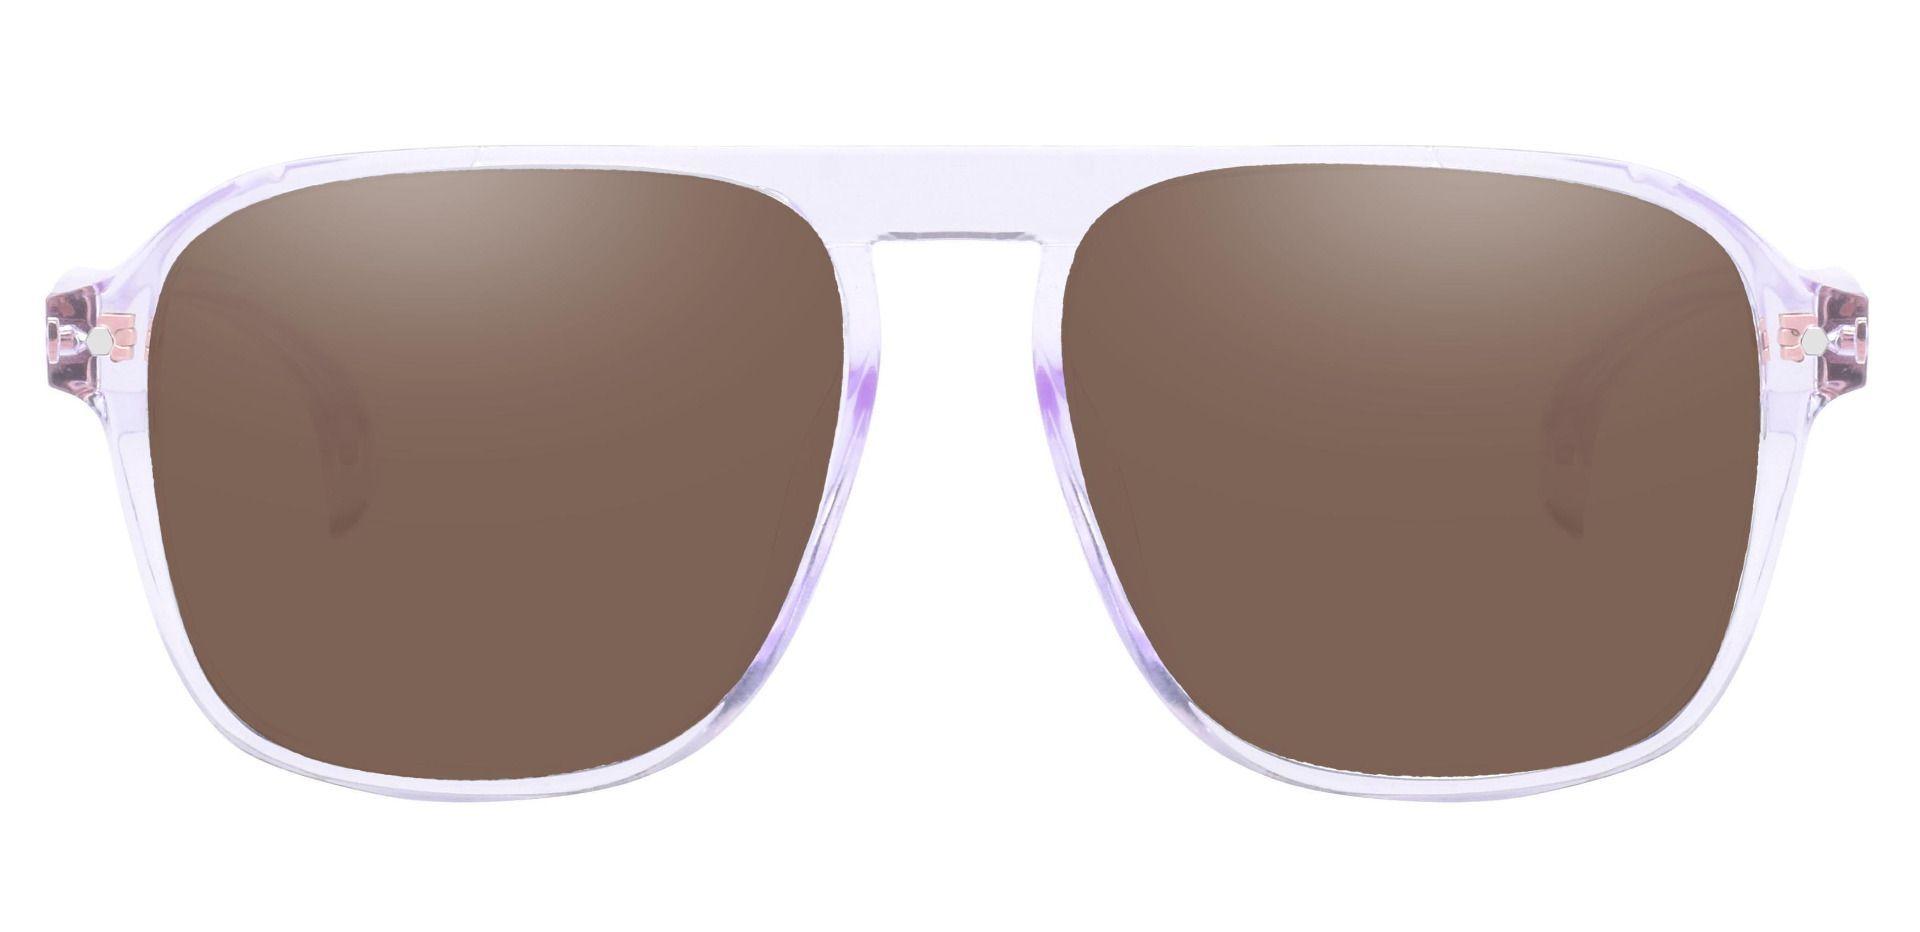 Gideon Aviator Prescription Sunglasses - Clear Frame With Brown Lenses